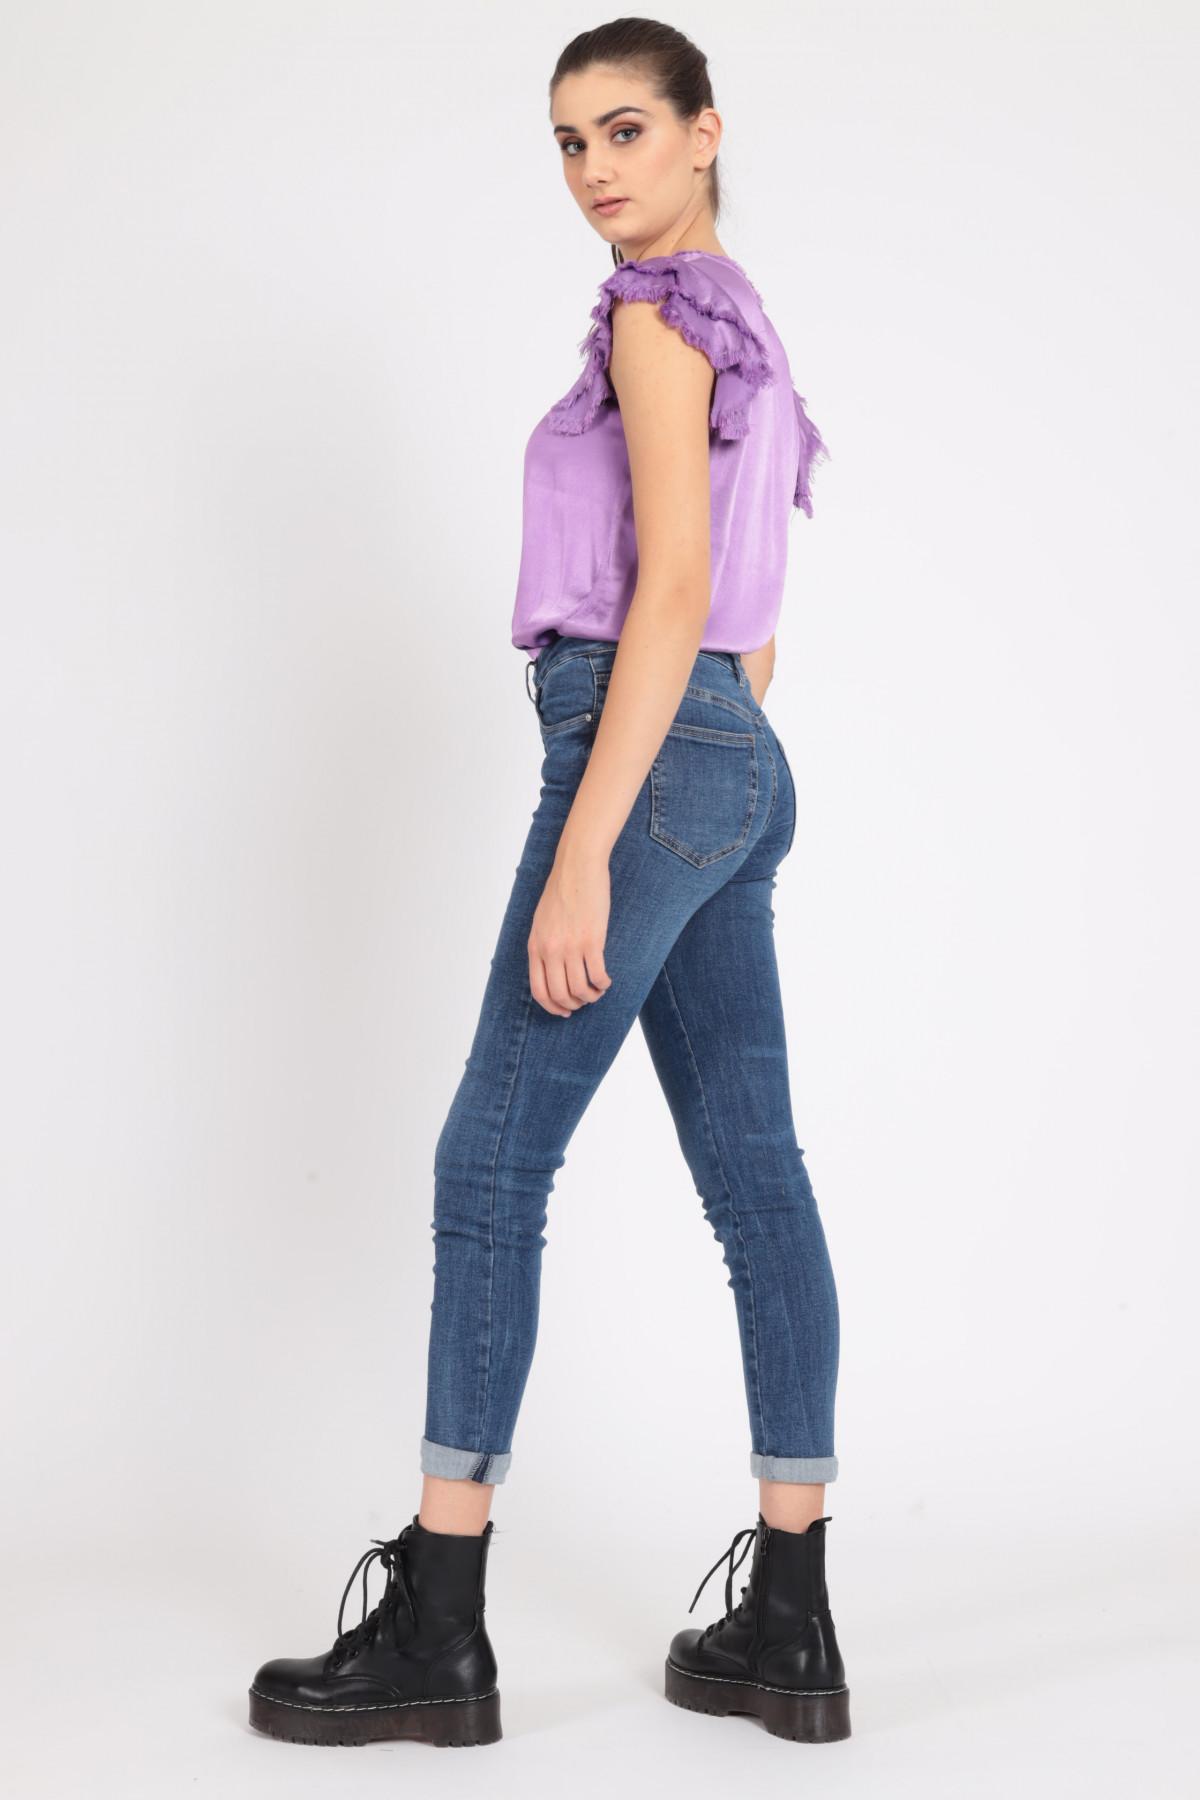 5 Skinny Pockets Jeans